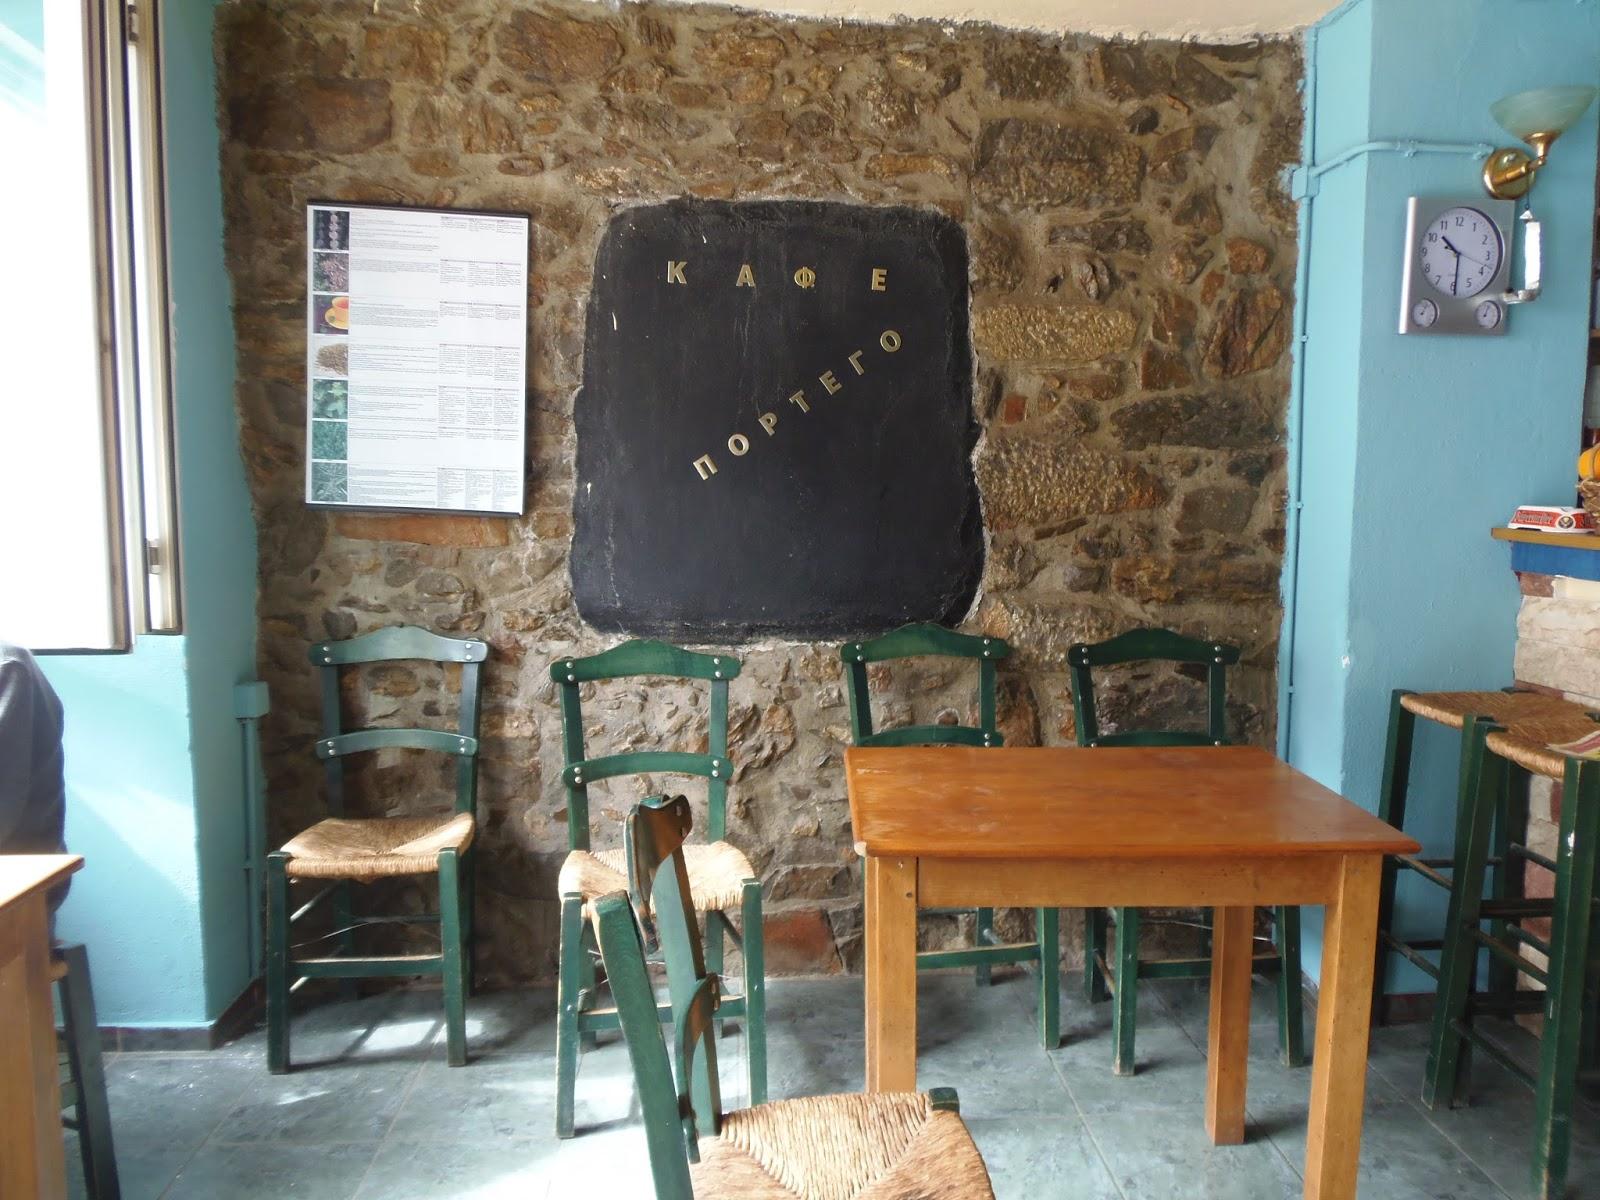 Village, cafe, raki, ouzo, ouso, travel, traveling, crete, greece, olive oil, bread, food